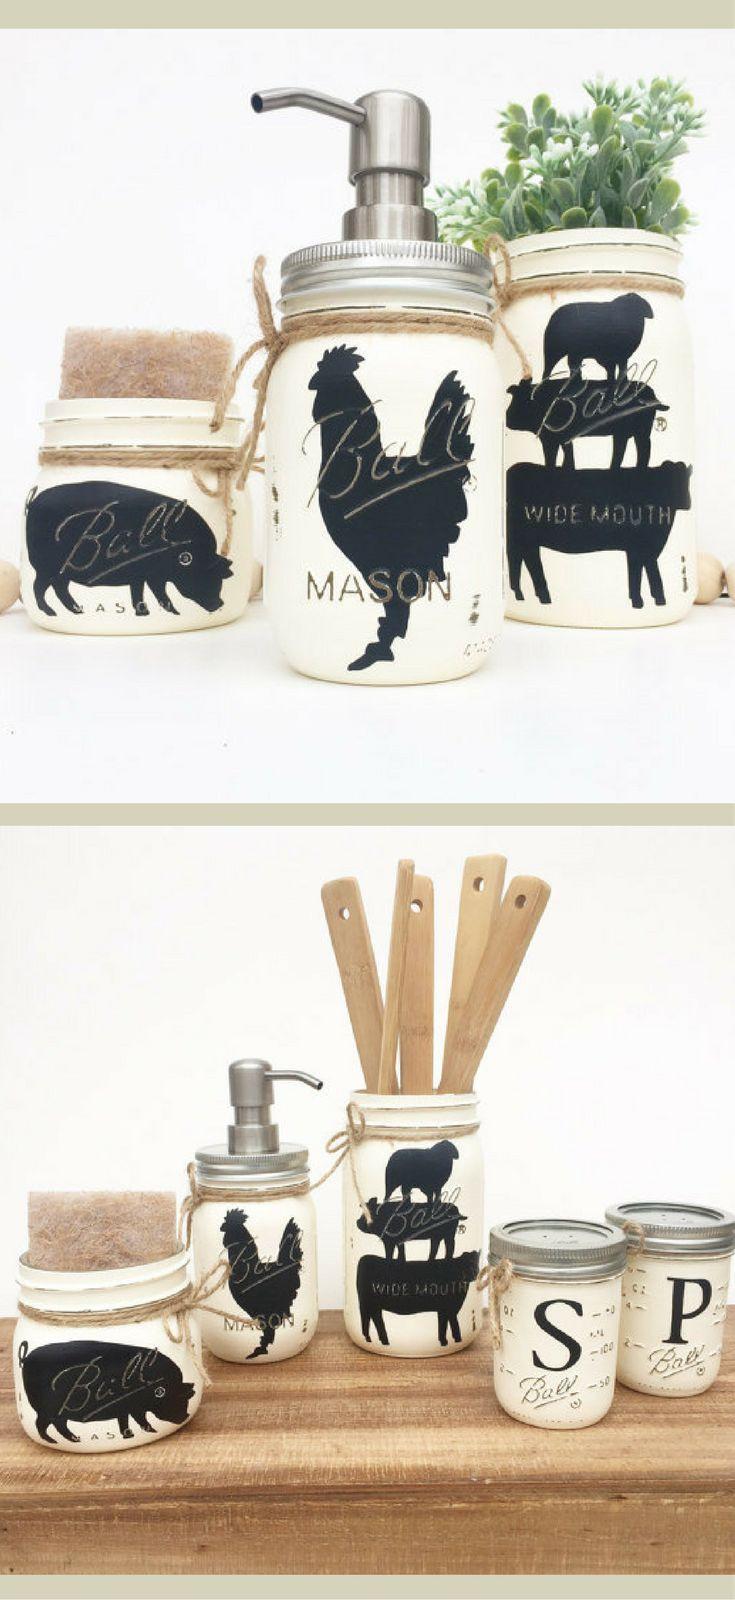 Best ideas about Farm Animal Kitchen Decor . Save or Pin Best 25 Pig kitchen decor ideas on Pinterest Now.